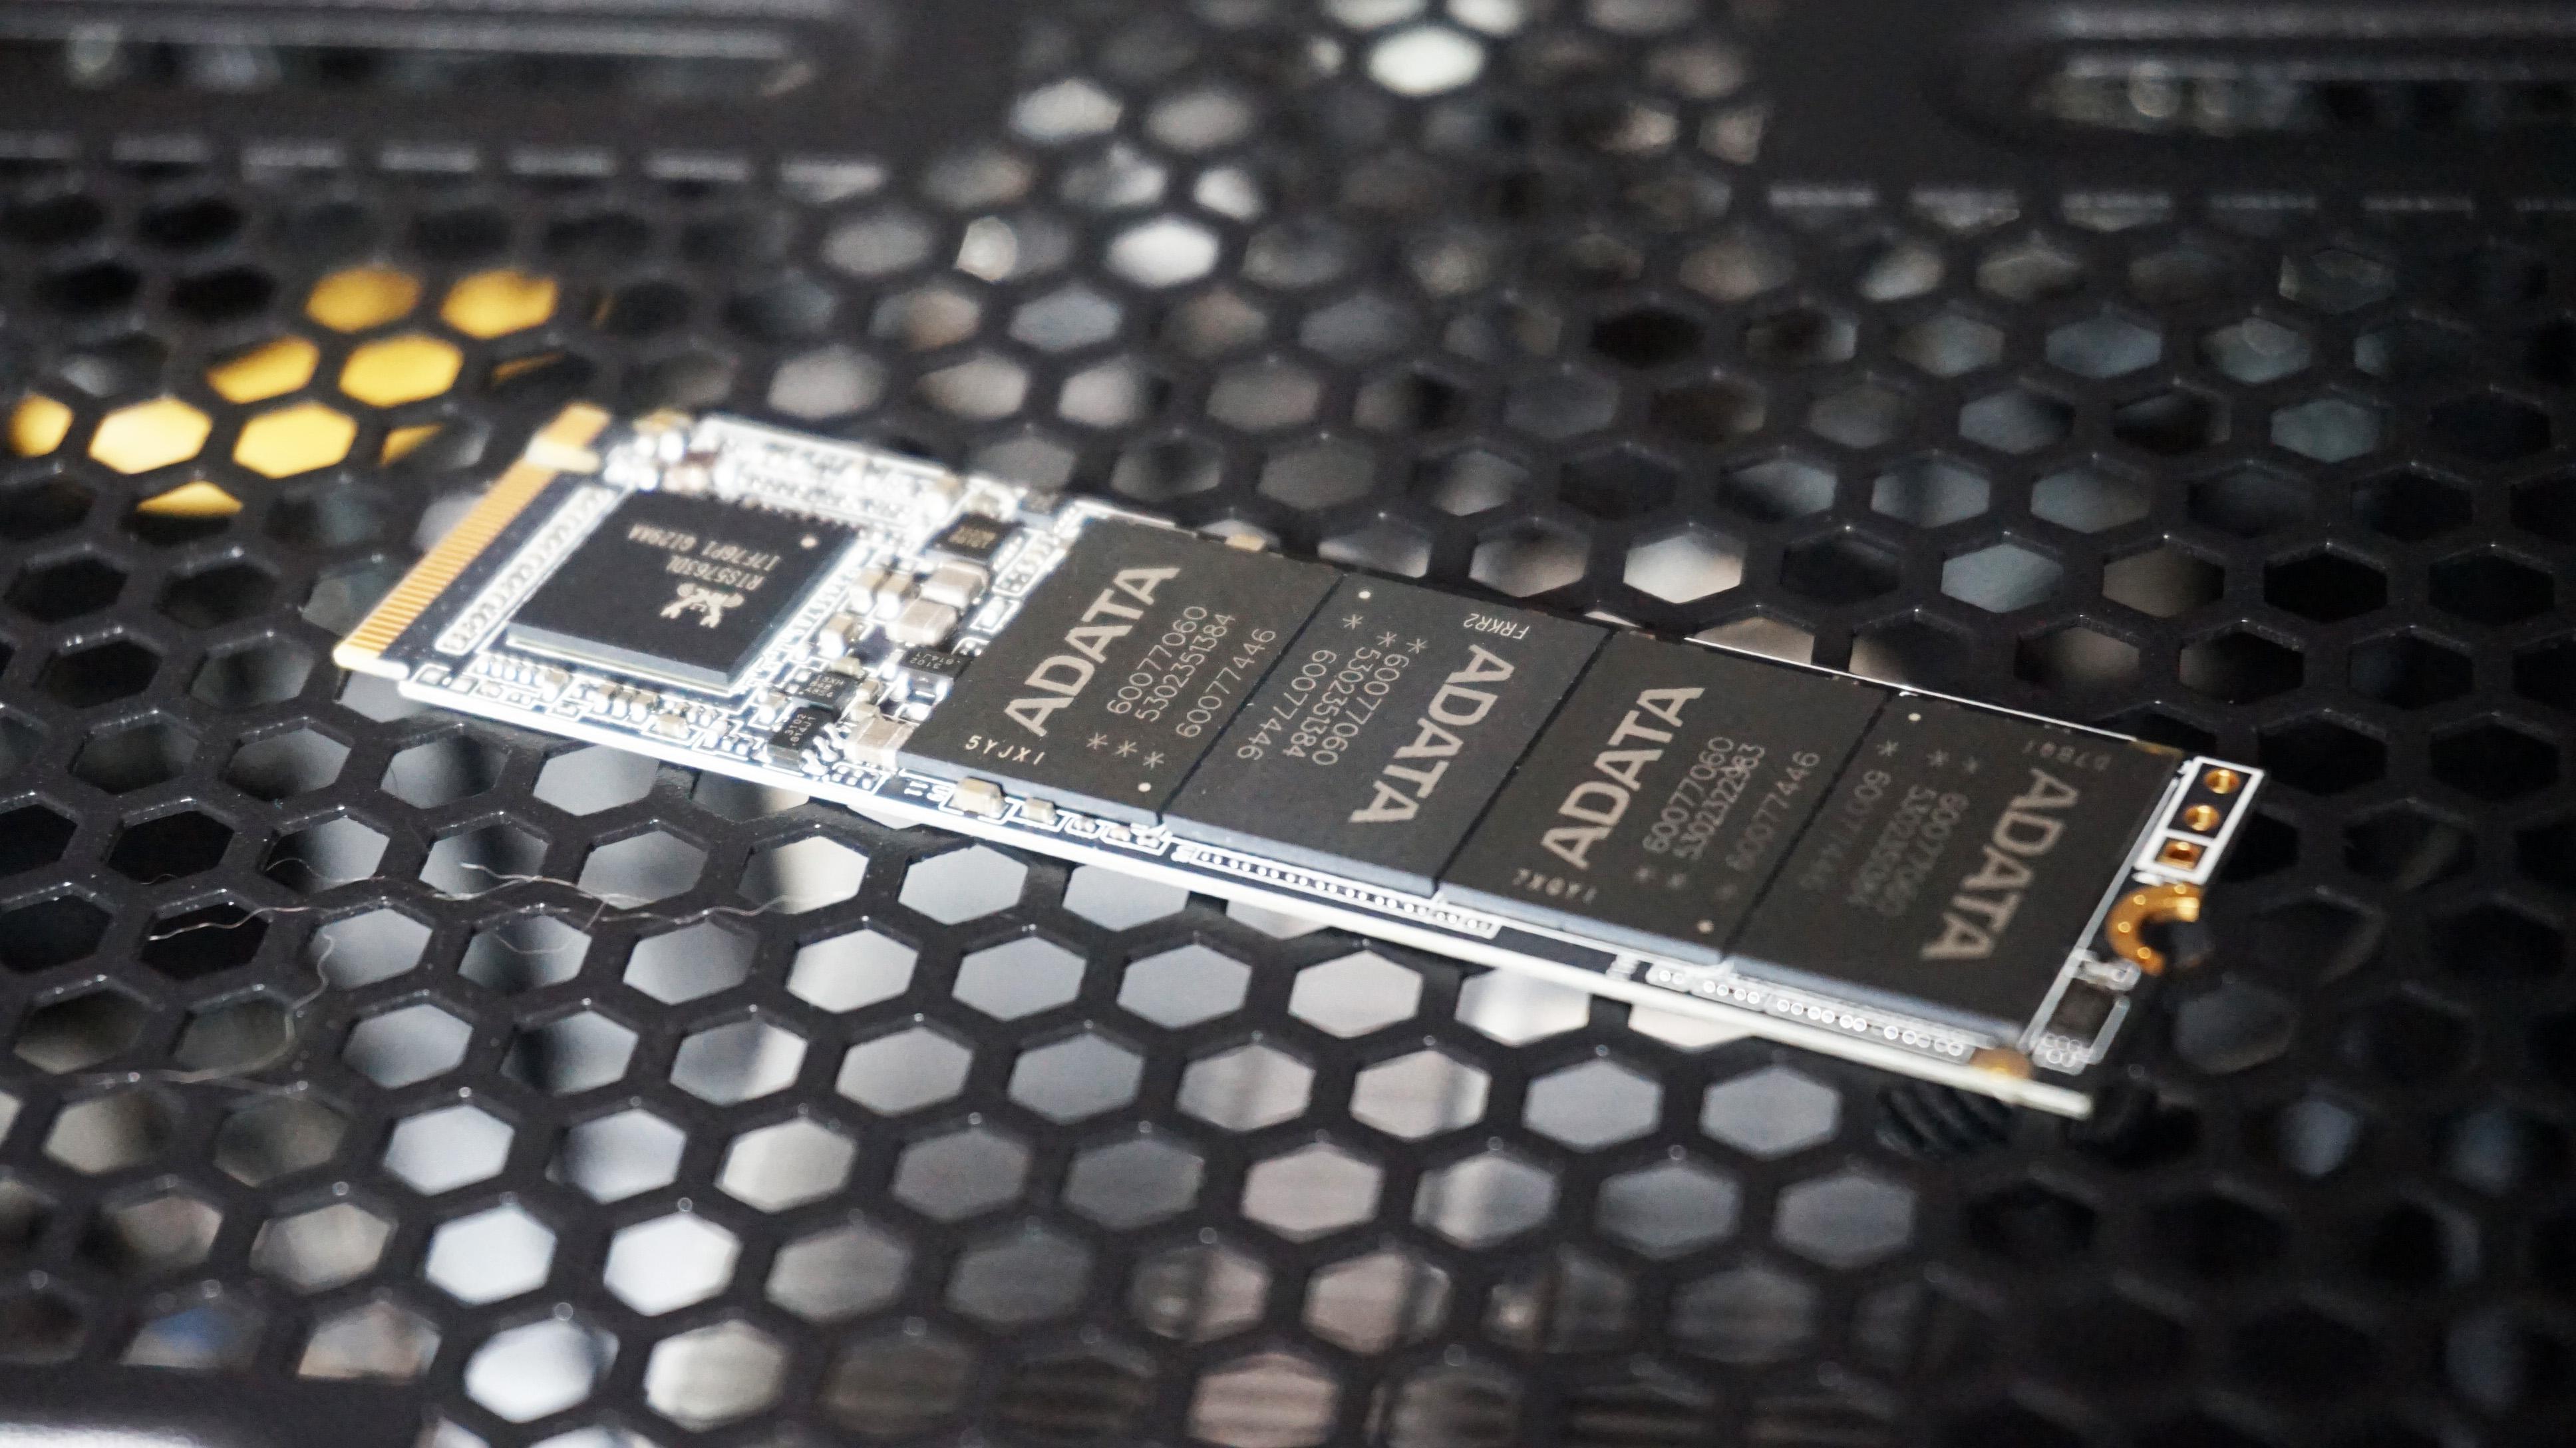 Adata XPG SX6000 Pro review: A budget alternative to